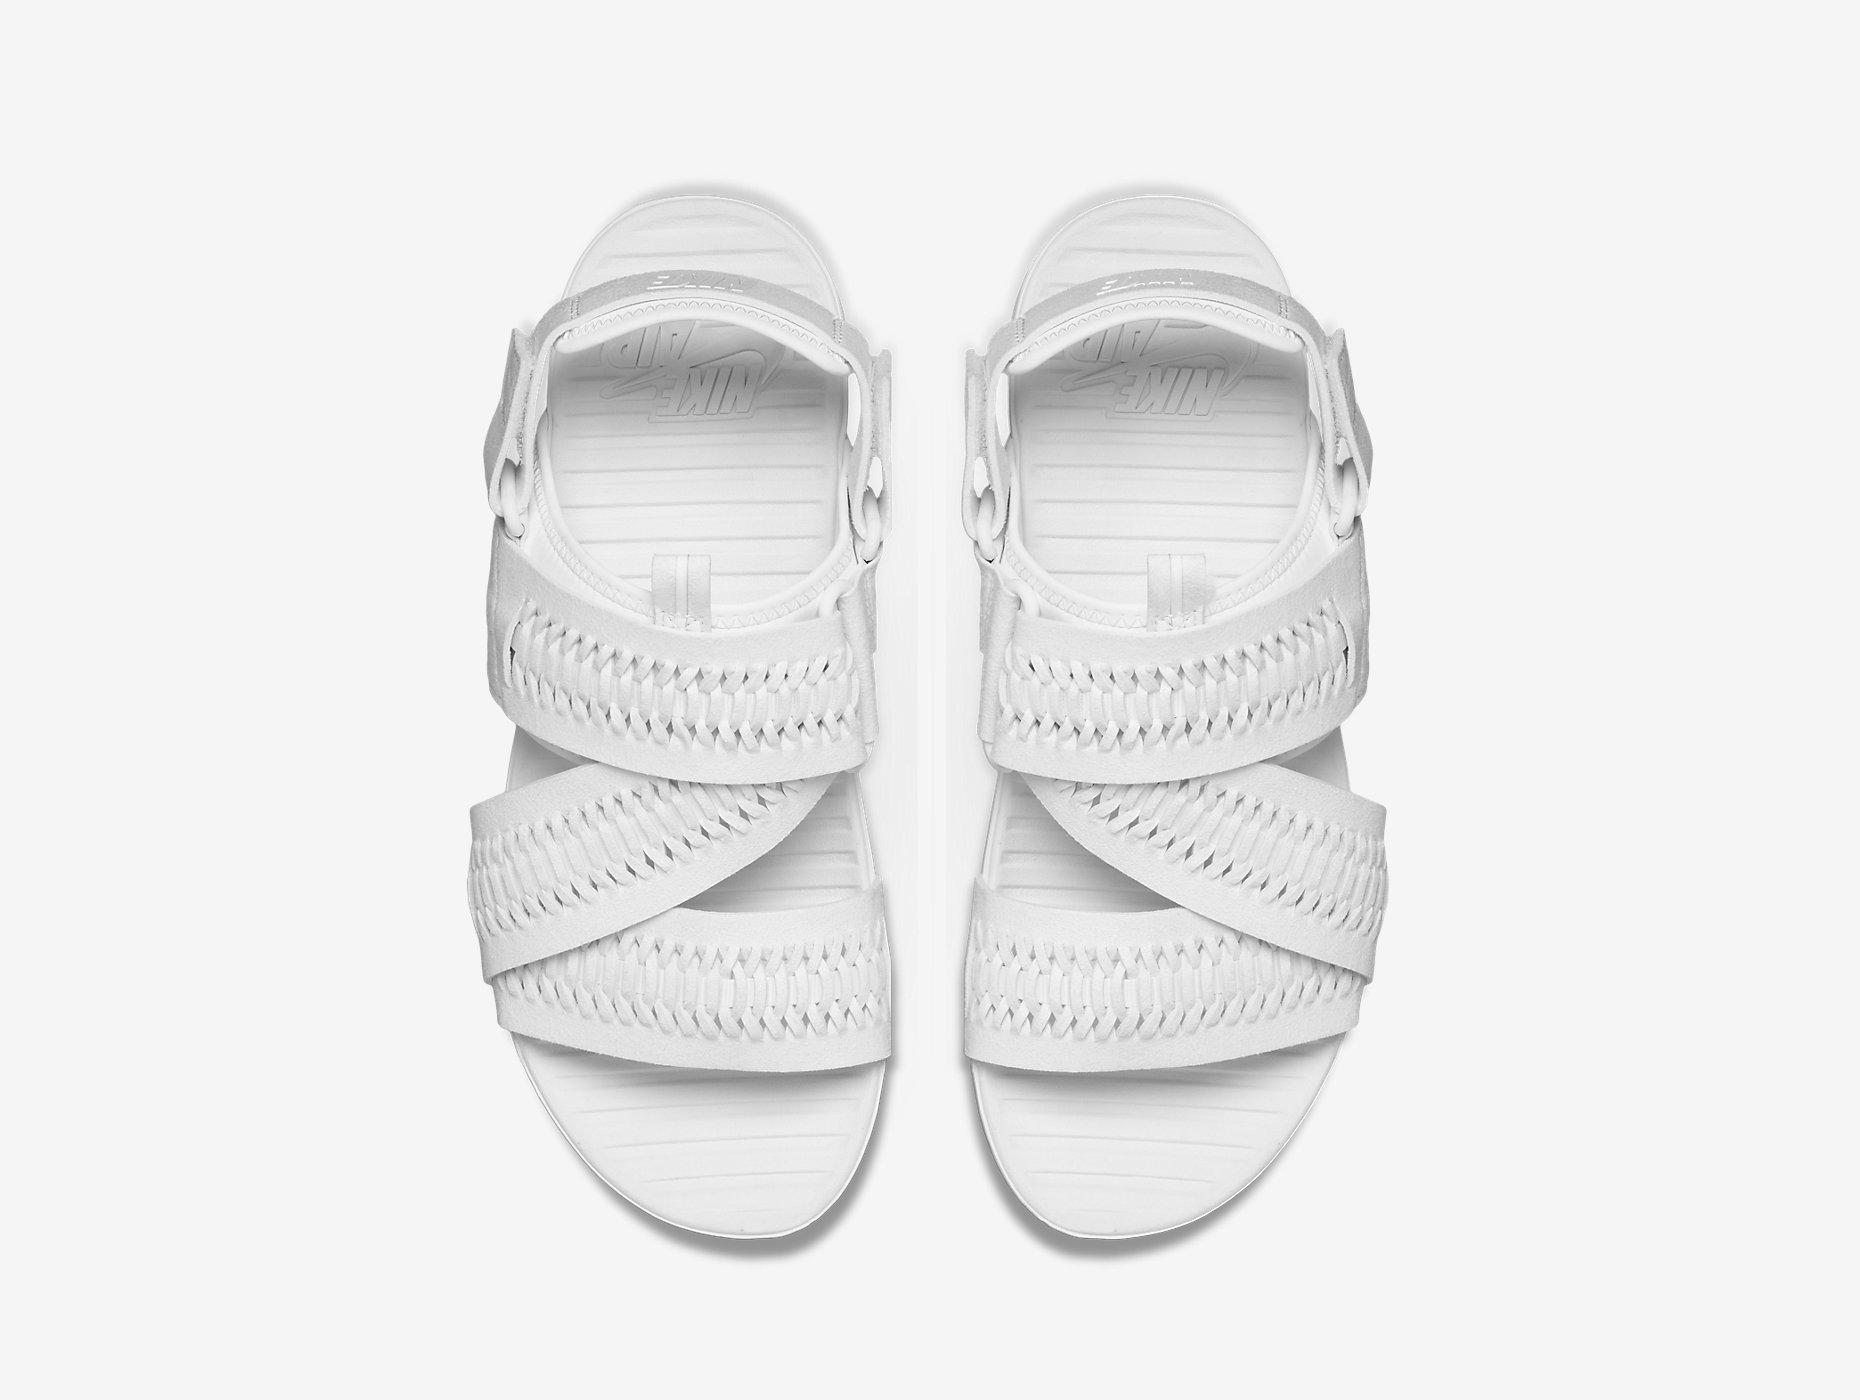 c3e229745d78 NikeLab Air Solarsoft Zigzag Woven